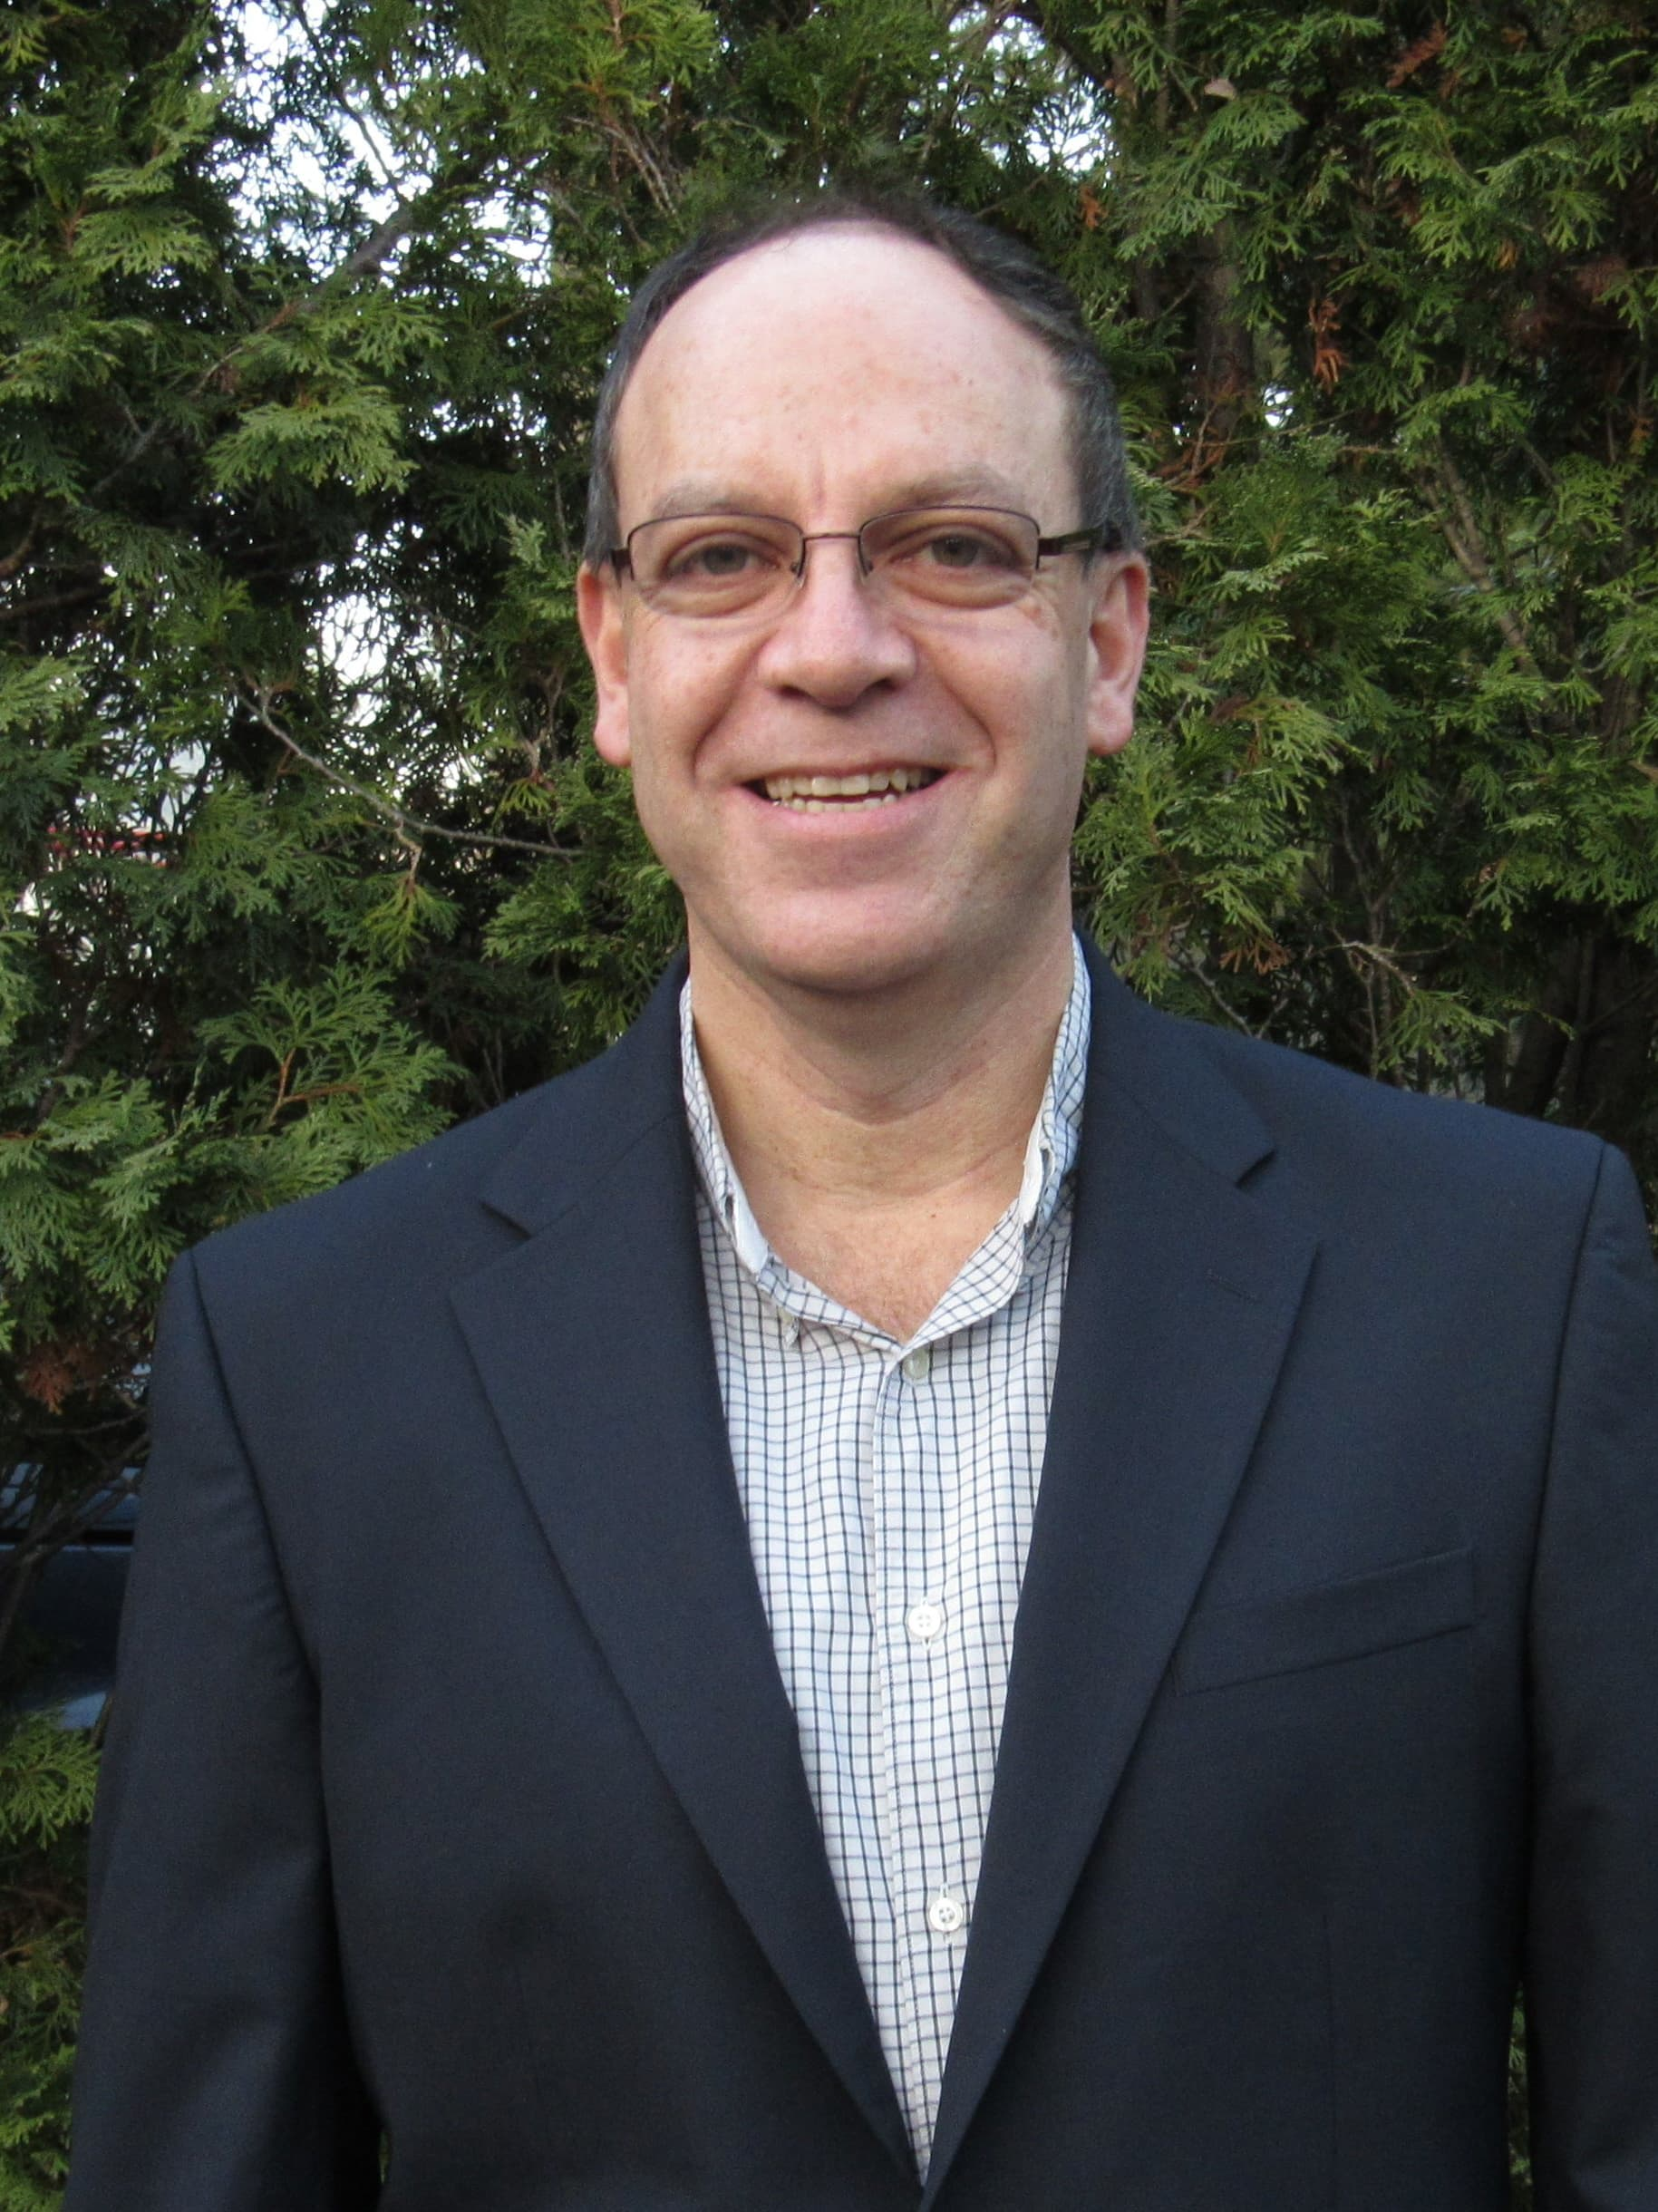 Jaime Grutzendler